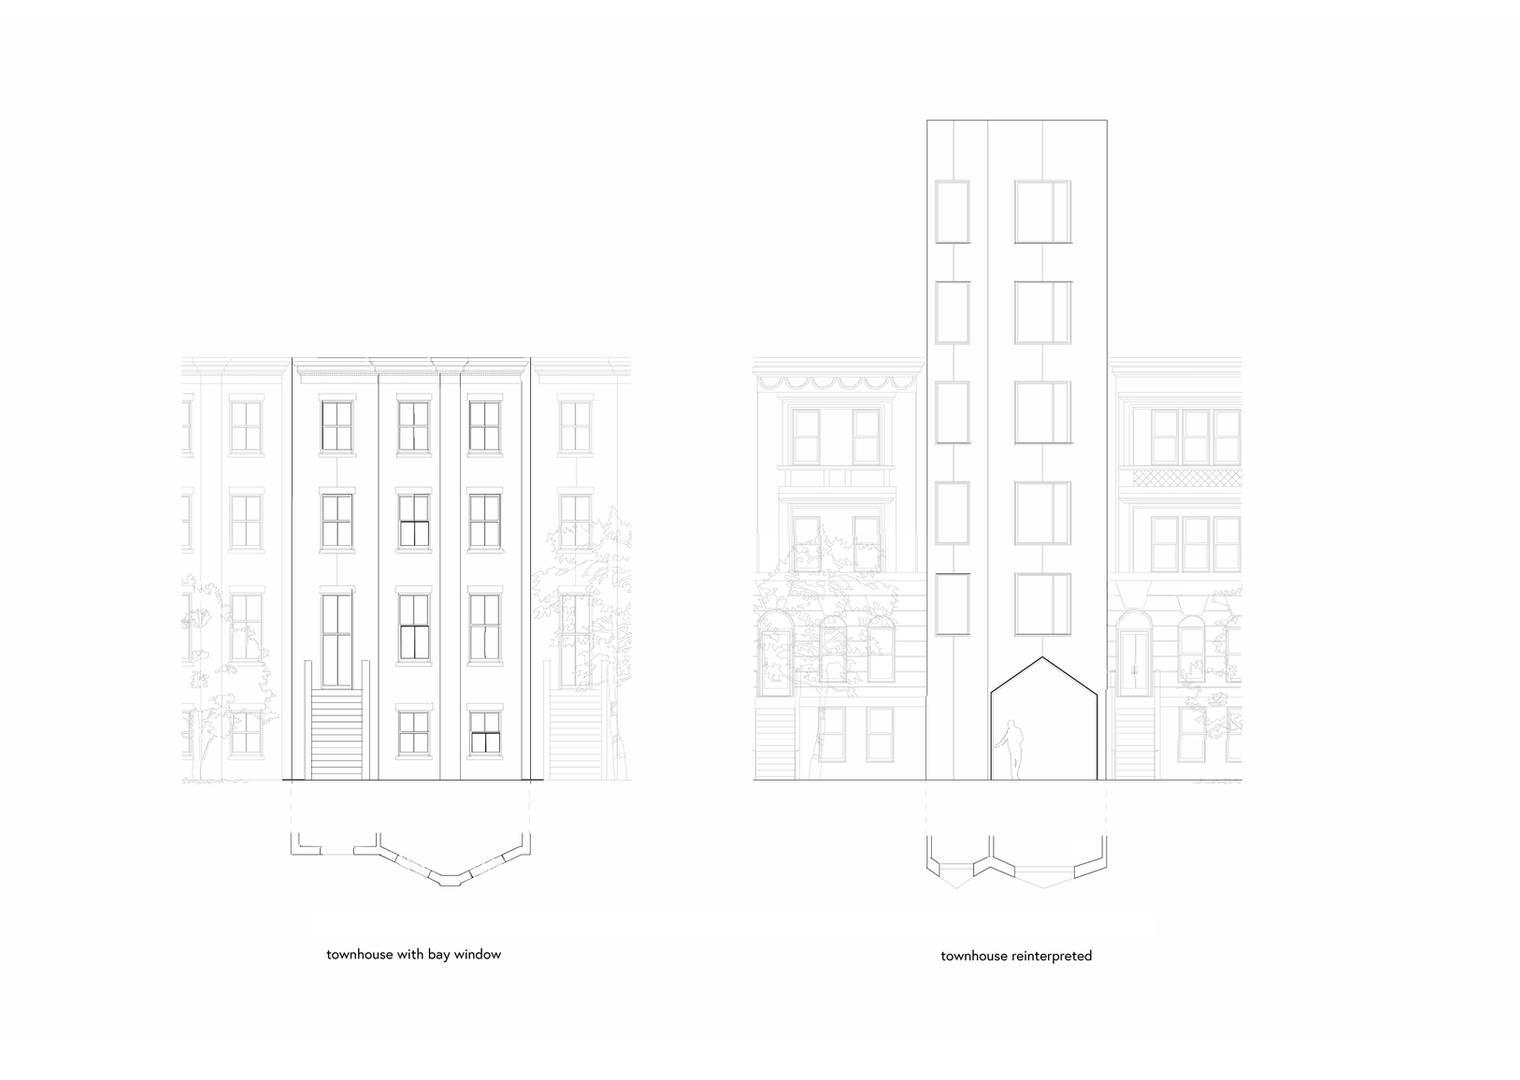 townhouse_diagram small.jpg